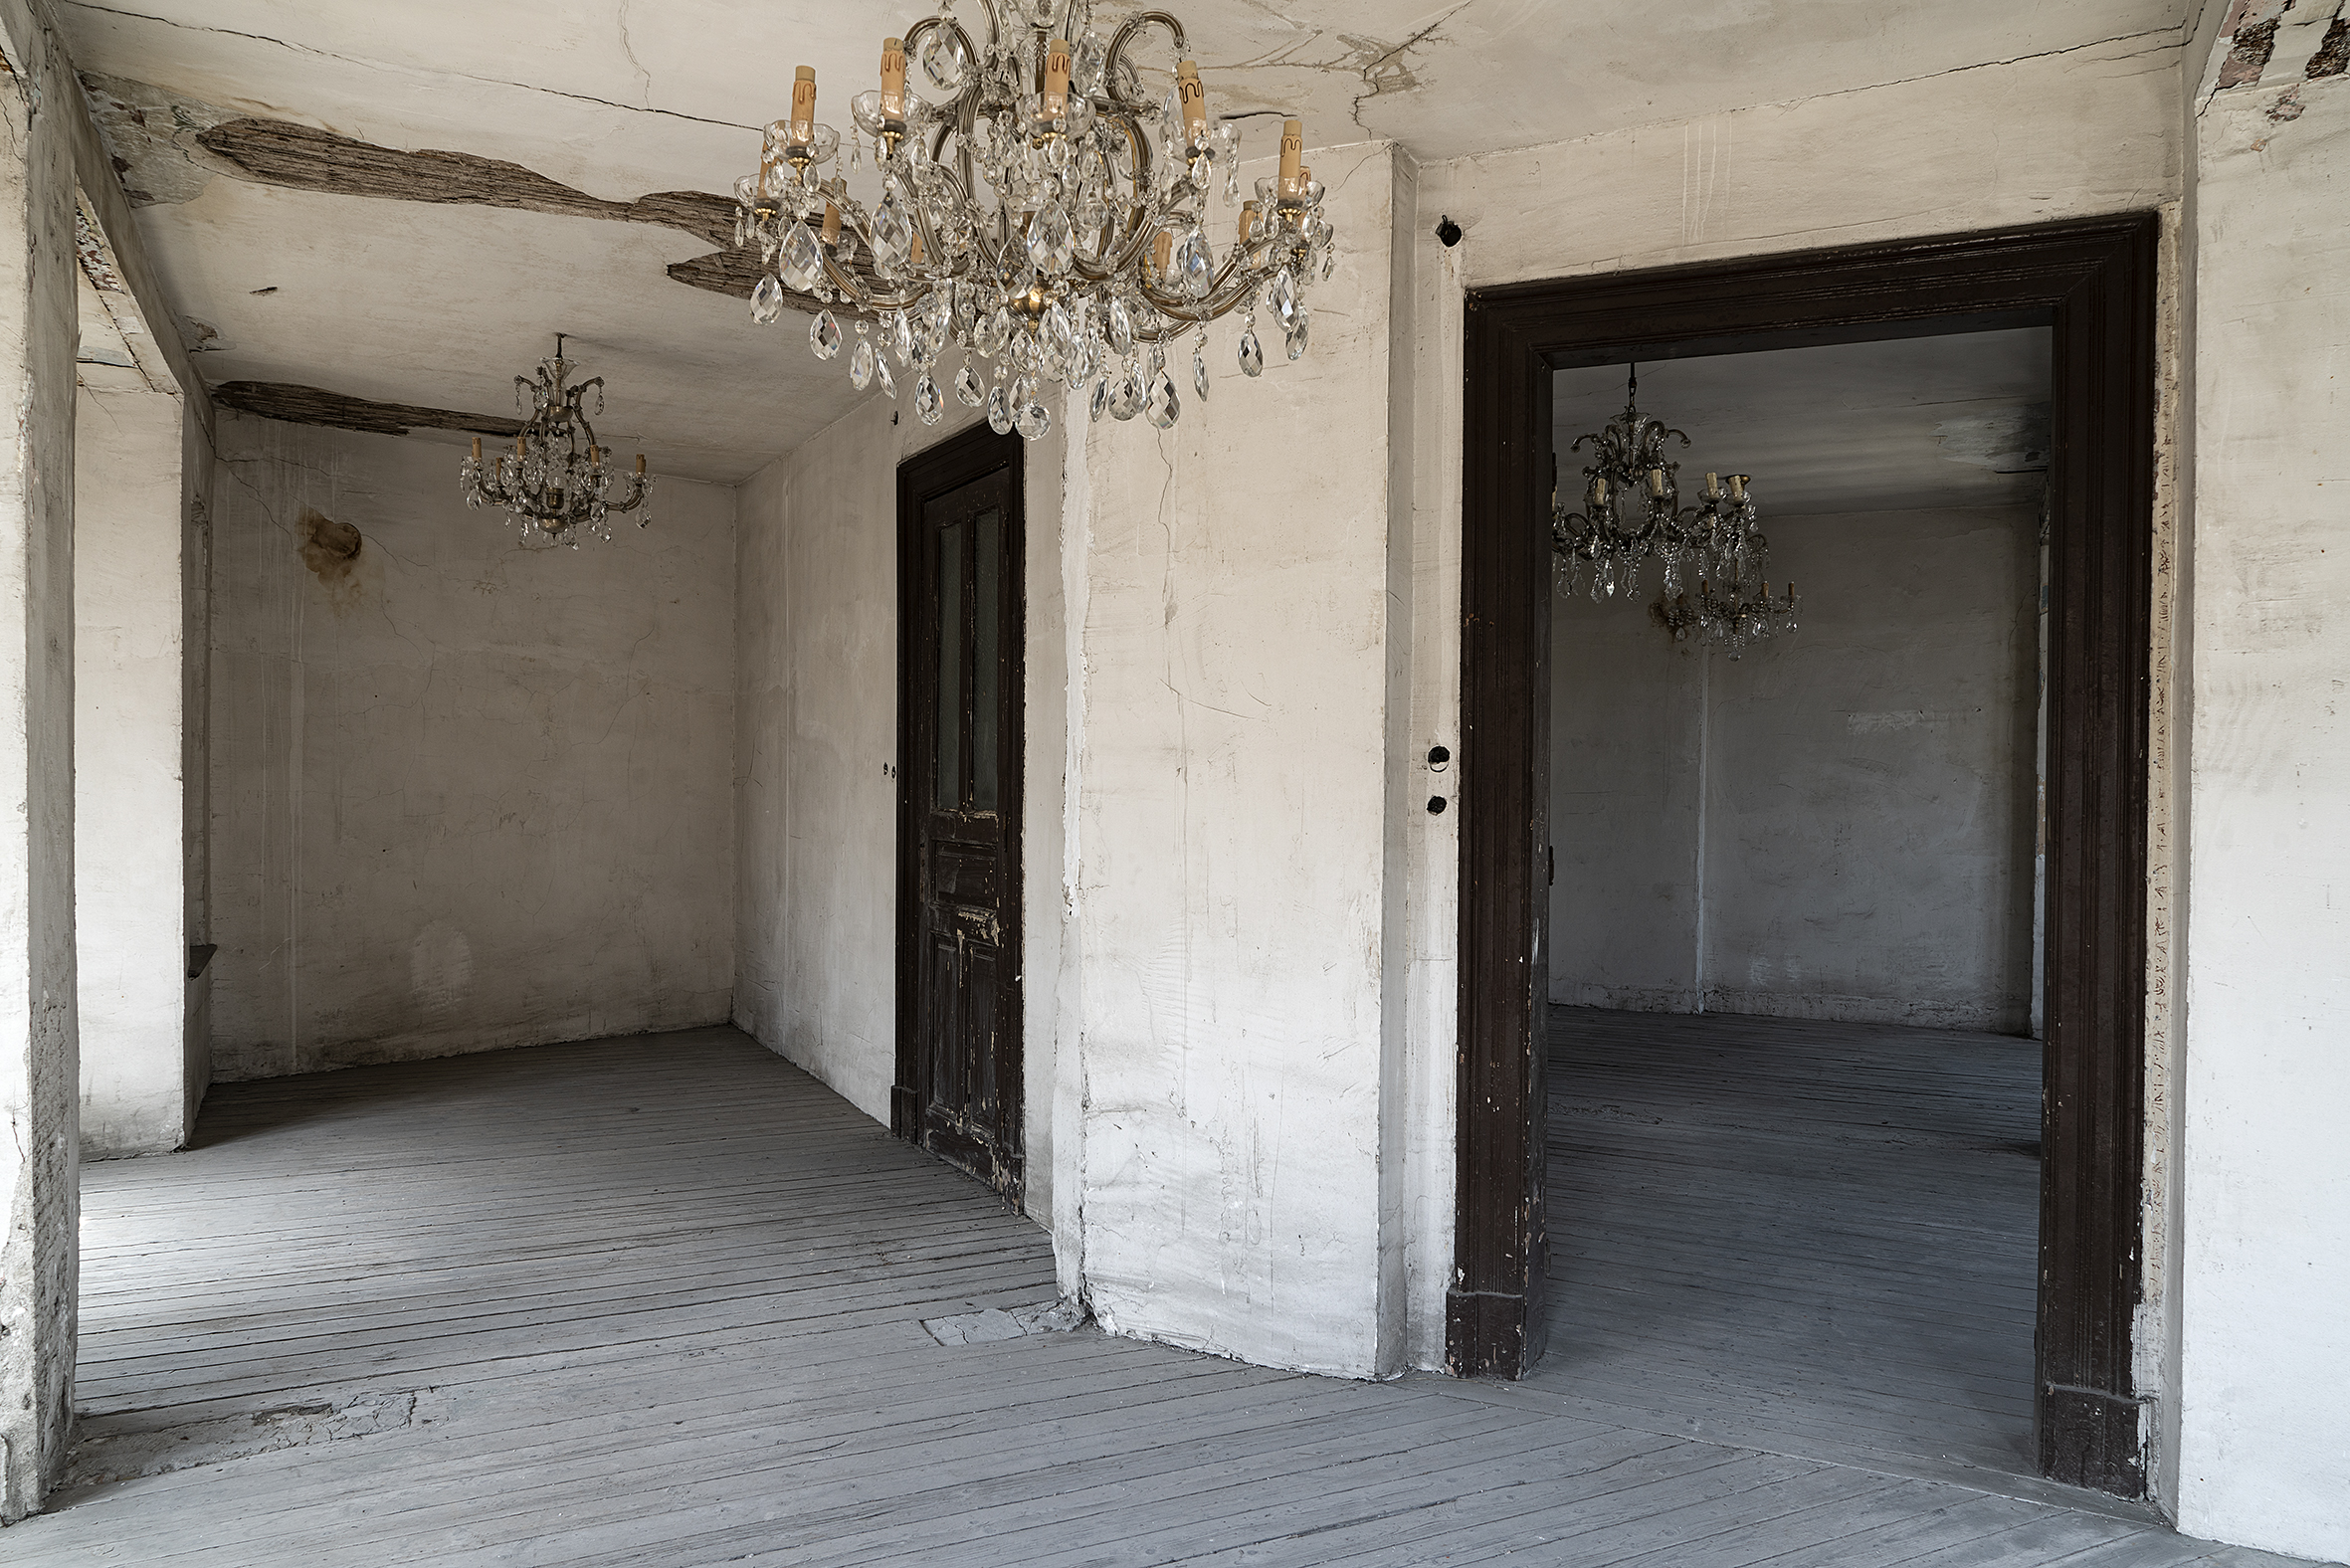 Gian-Maria-Tosatti-Kalbim-Ayna-Gibi-Bos-–-Istanbul-Bolumu-2021-11